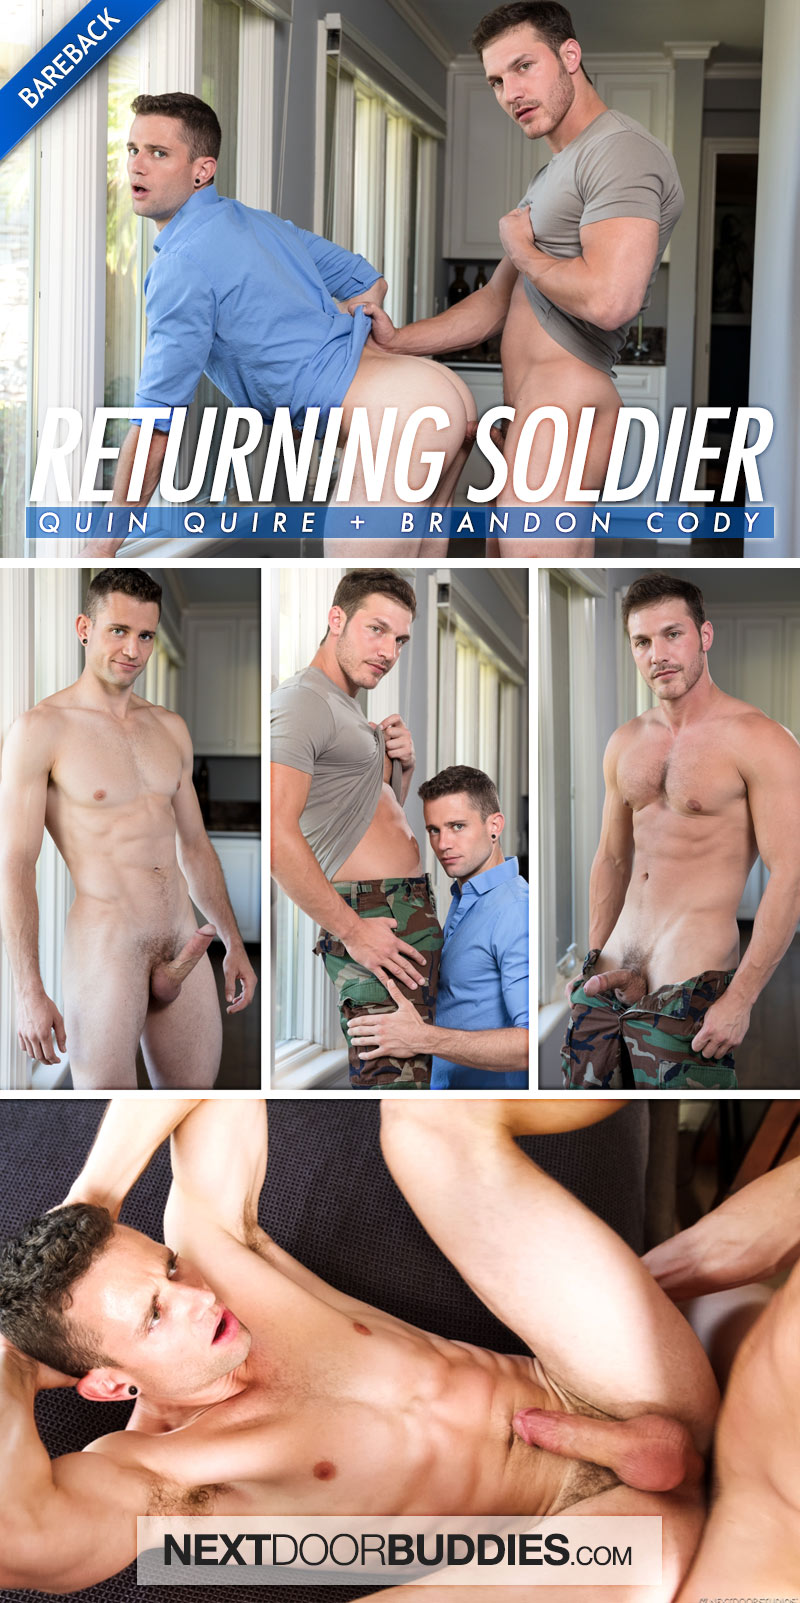 Returning Soldier (Brandon Cody Fucks Quin Quire) (Bareback) at Next Door Buddies